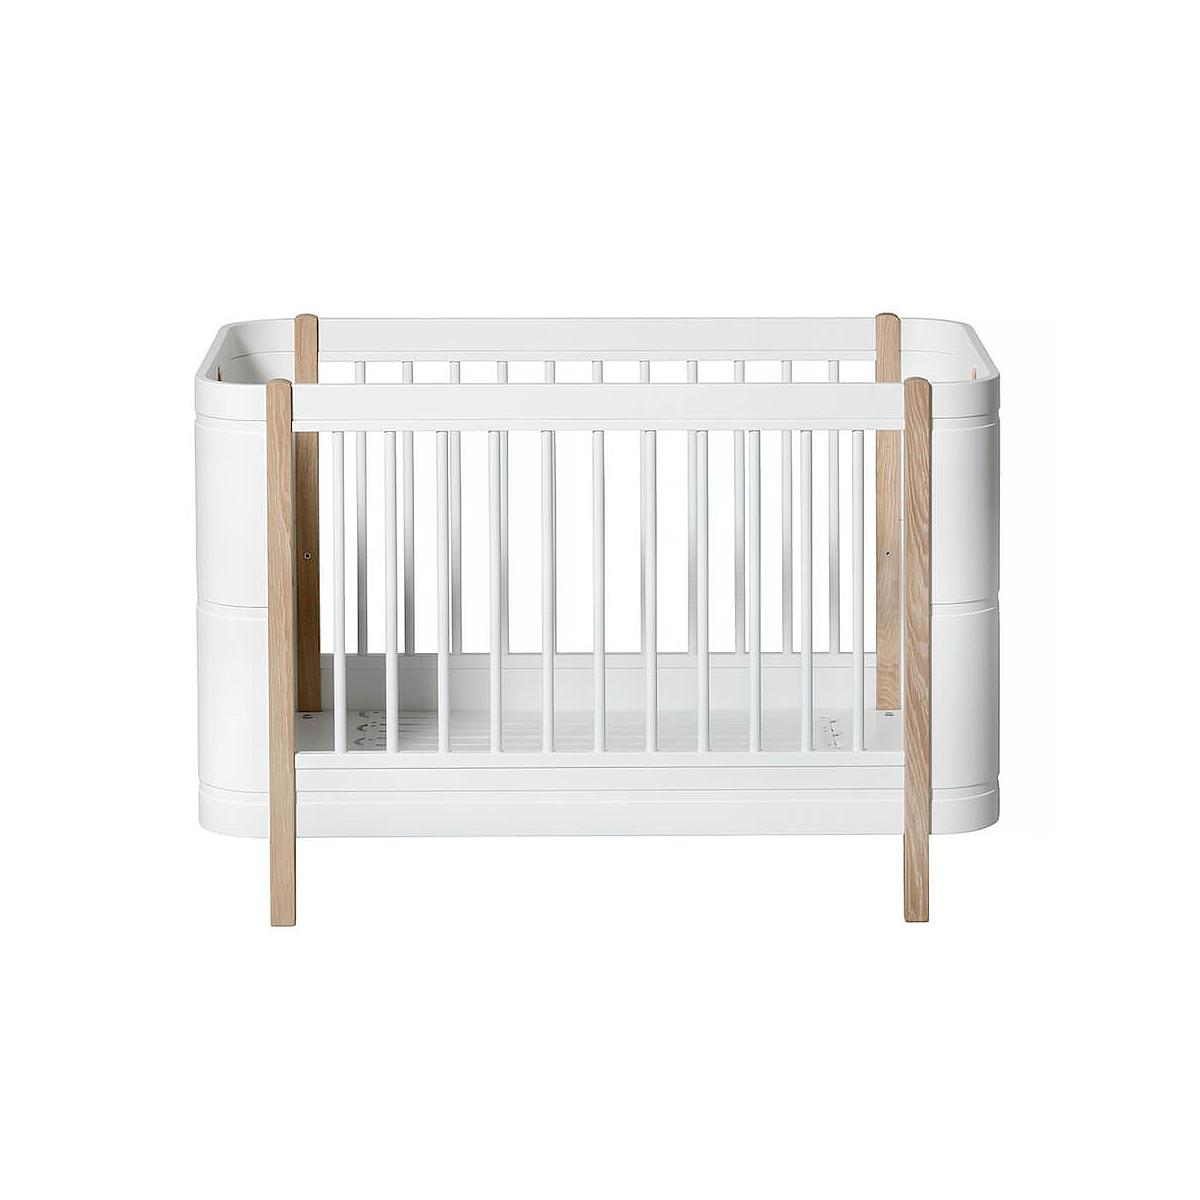 Cuna bebé evolutiva 68x122cm/162cm MINI+ WOOD Oliver Furniture blanco-roble